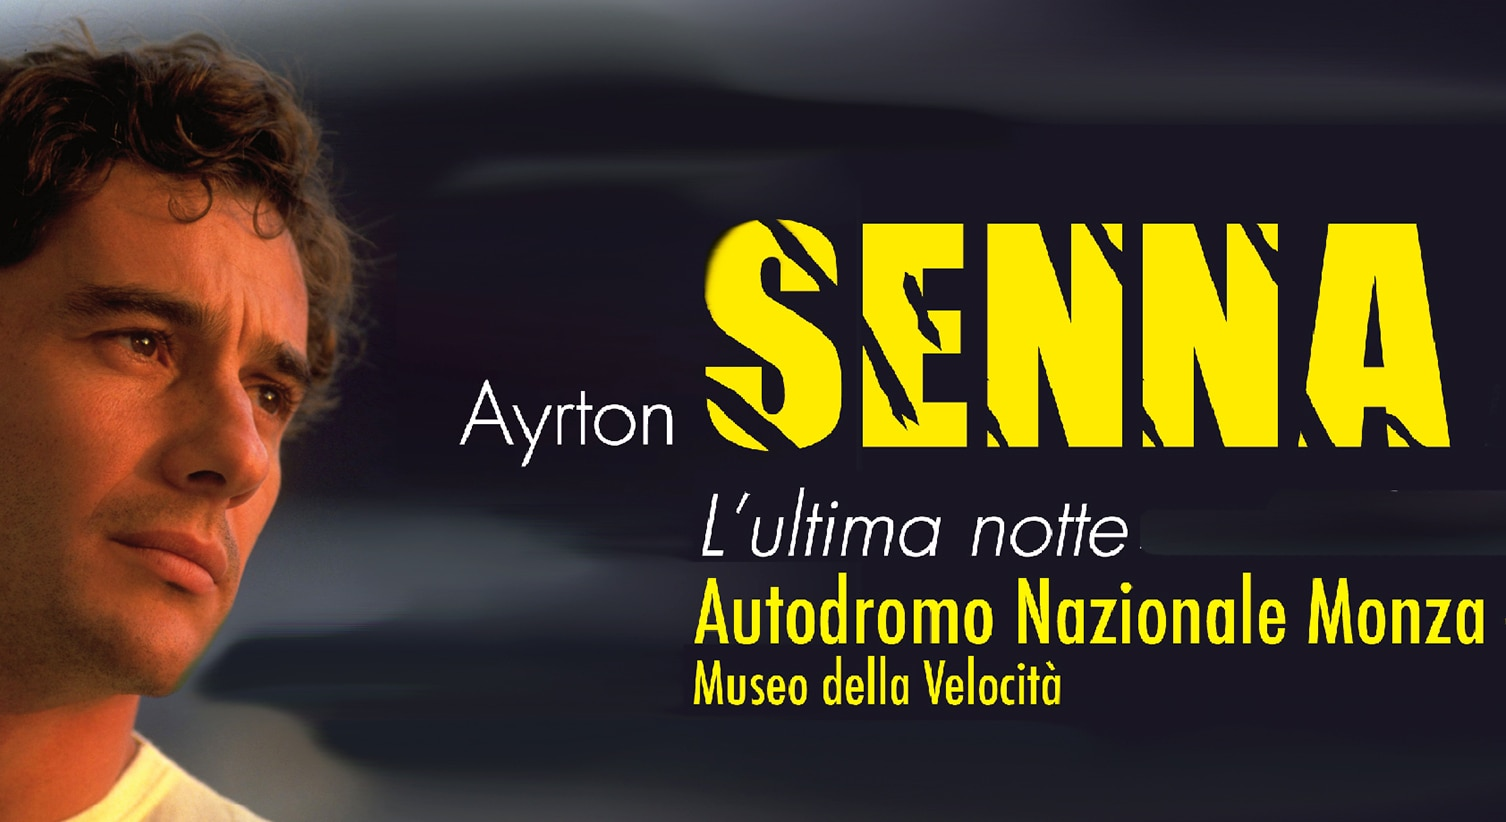 Ayrton-Senna-lultima-notte